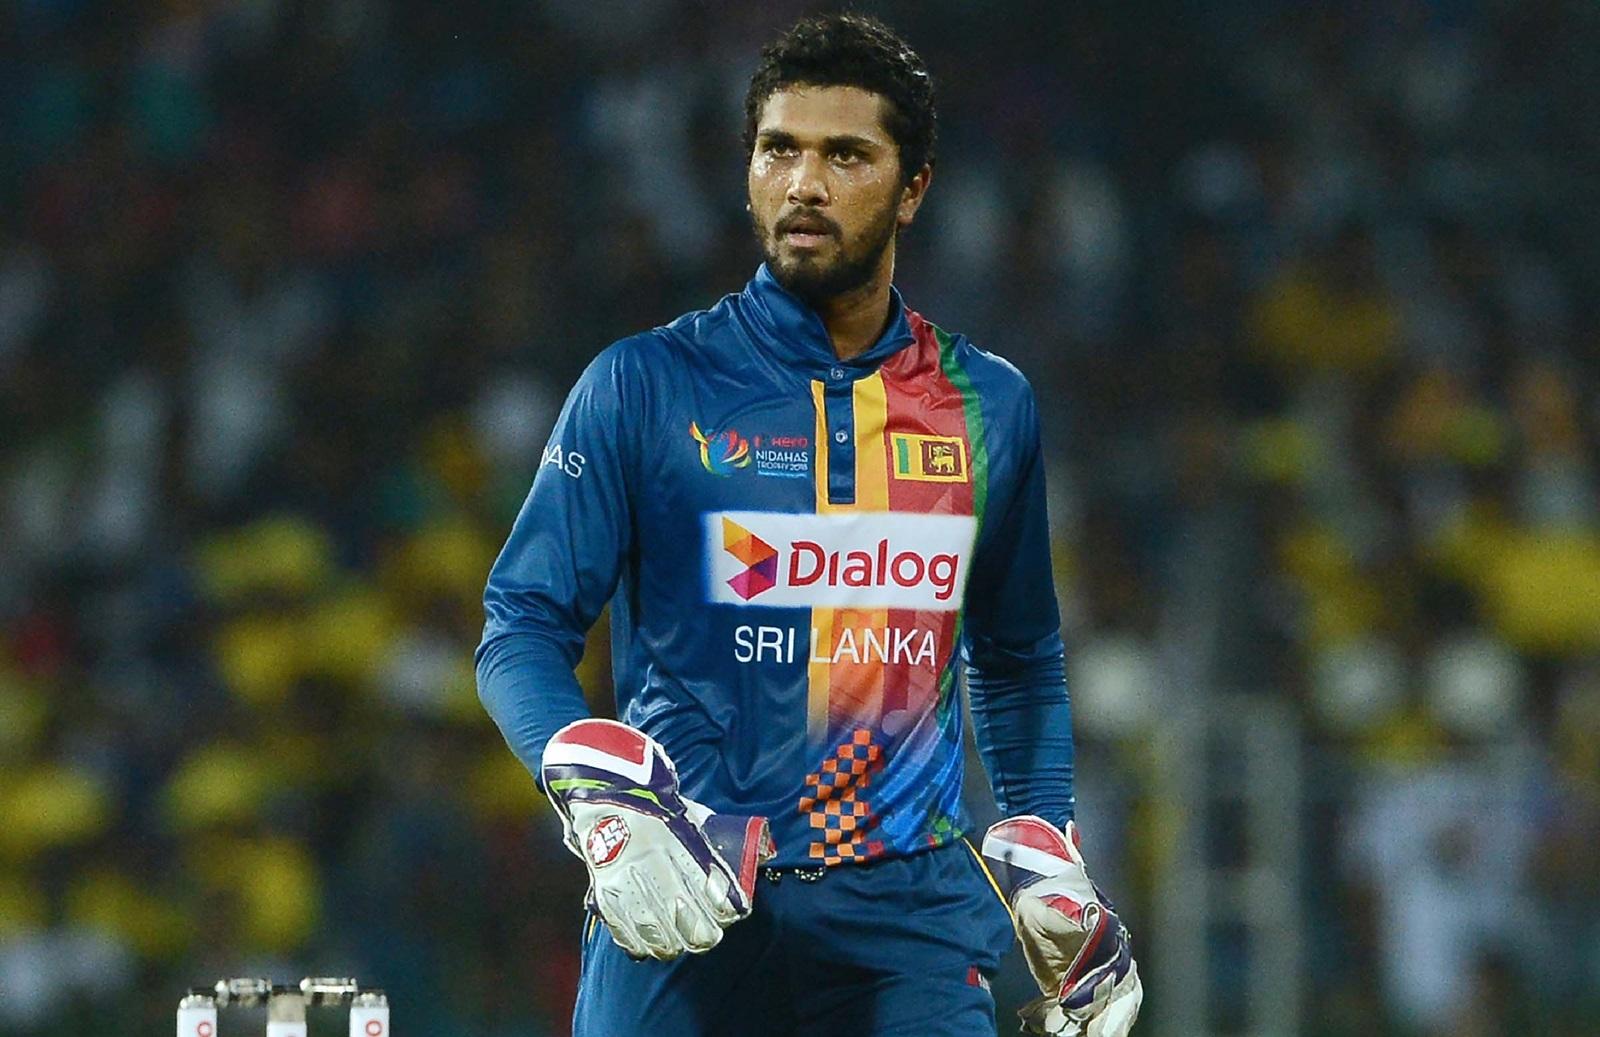 SL skipper Chandimal cops two-match ban   cricket.com.au